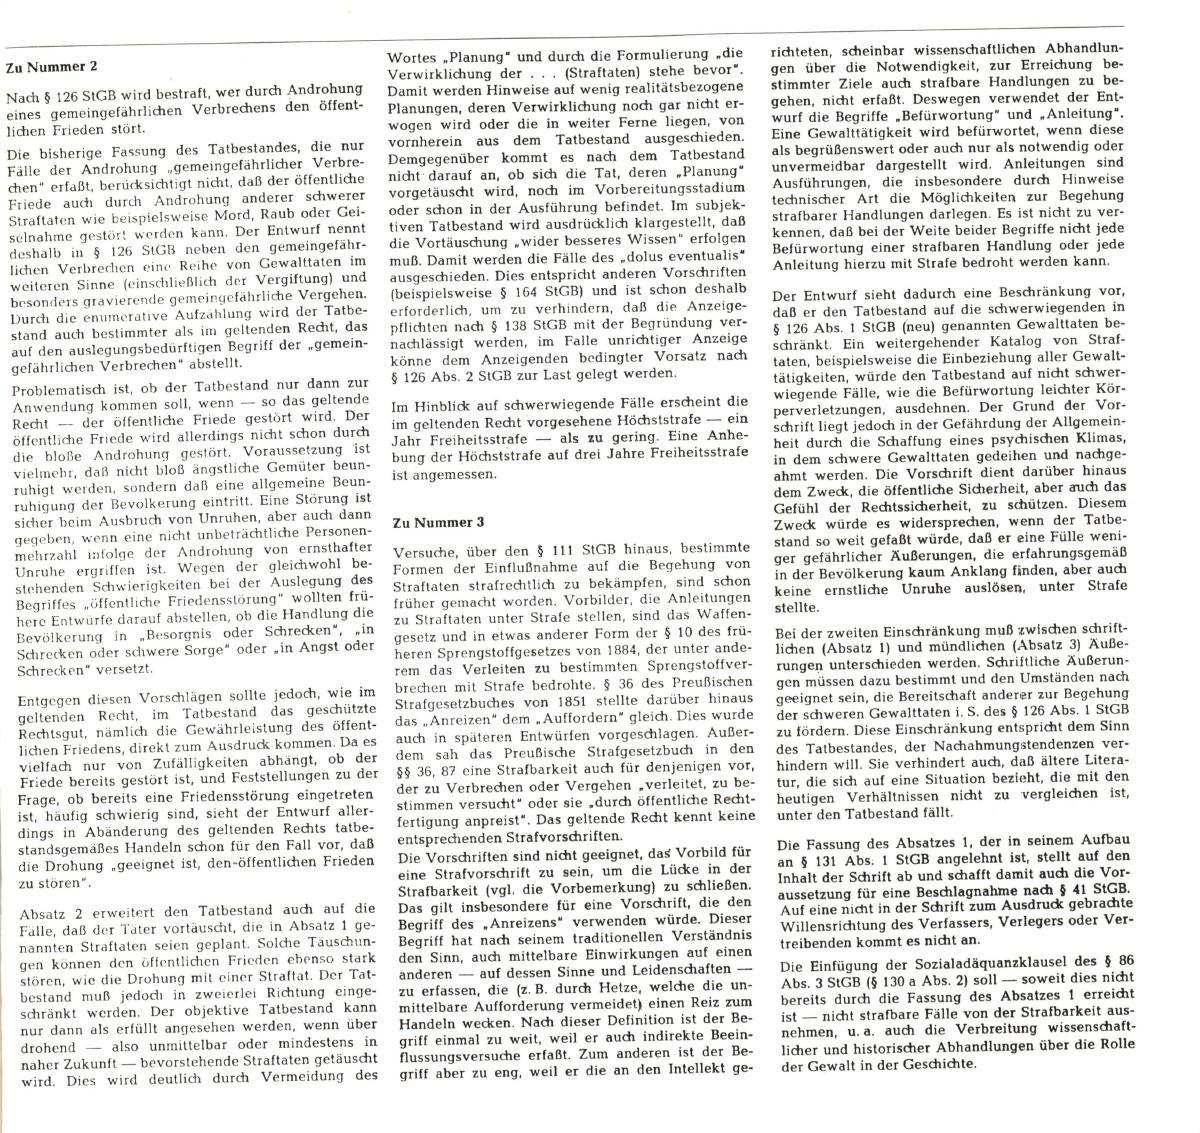 REP_VLB_1976_Die_Zensurgesetze_50